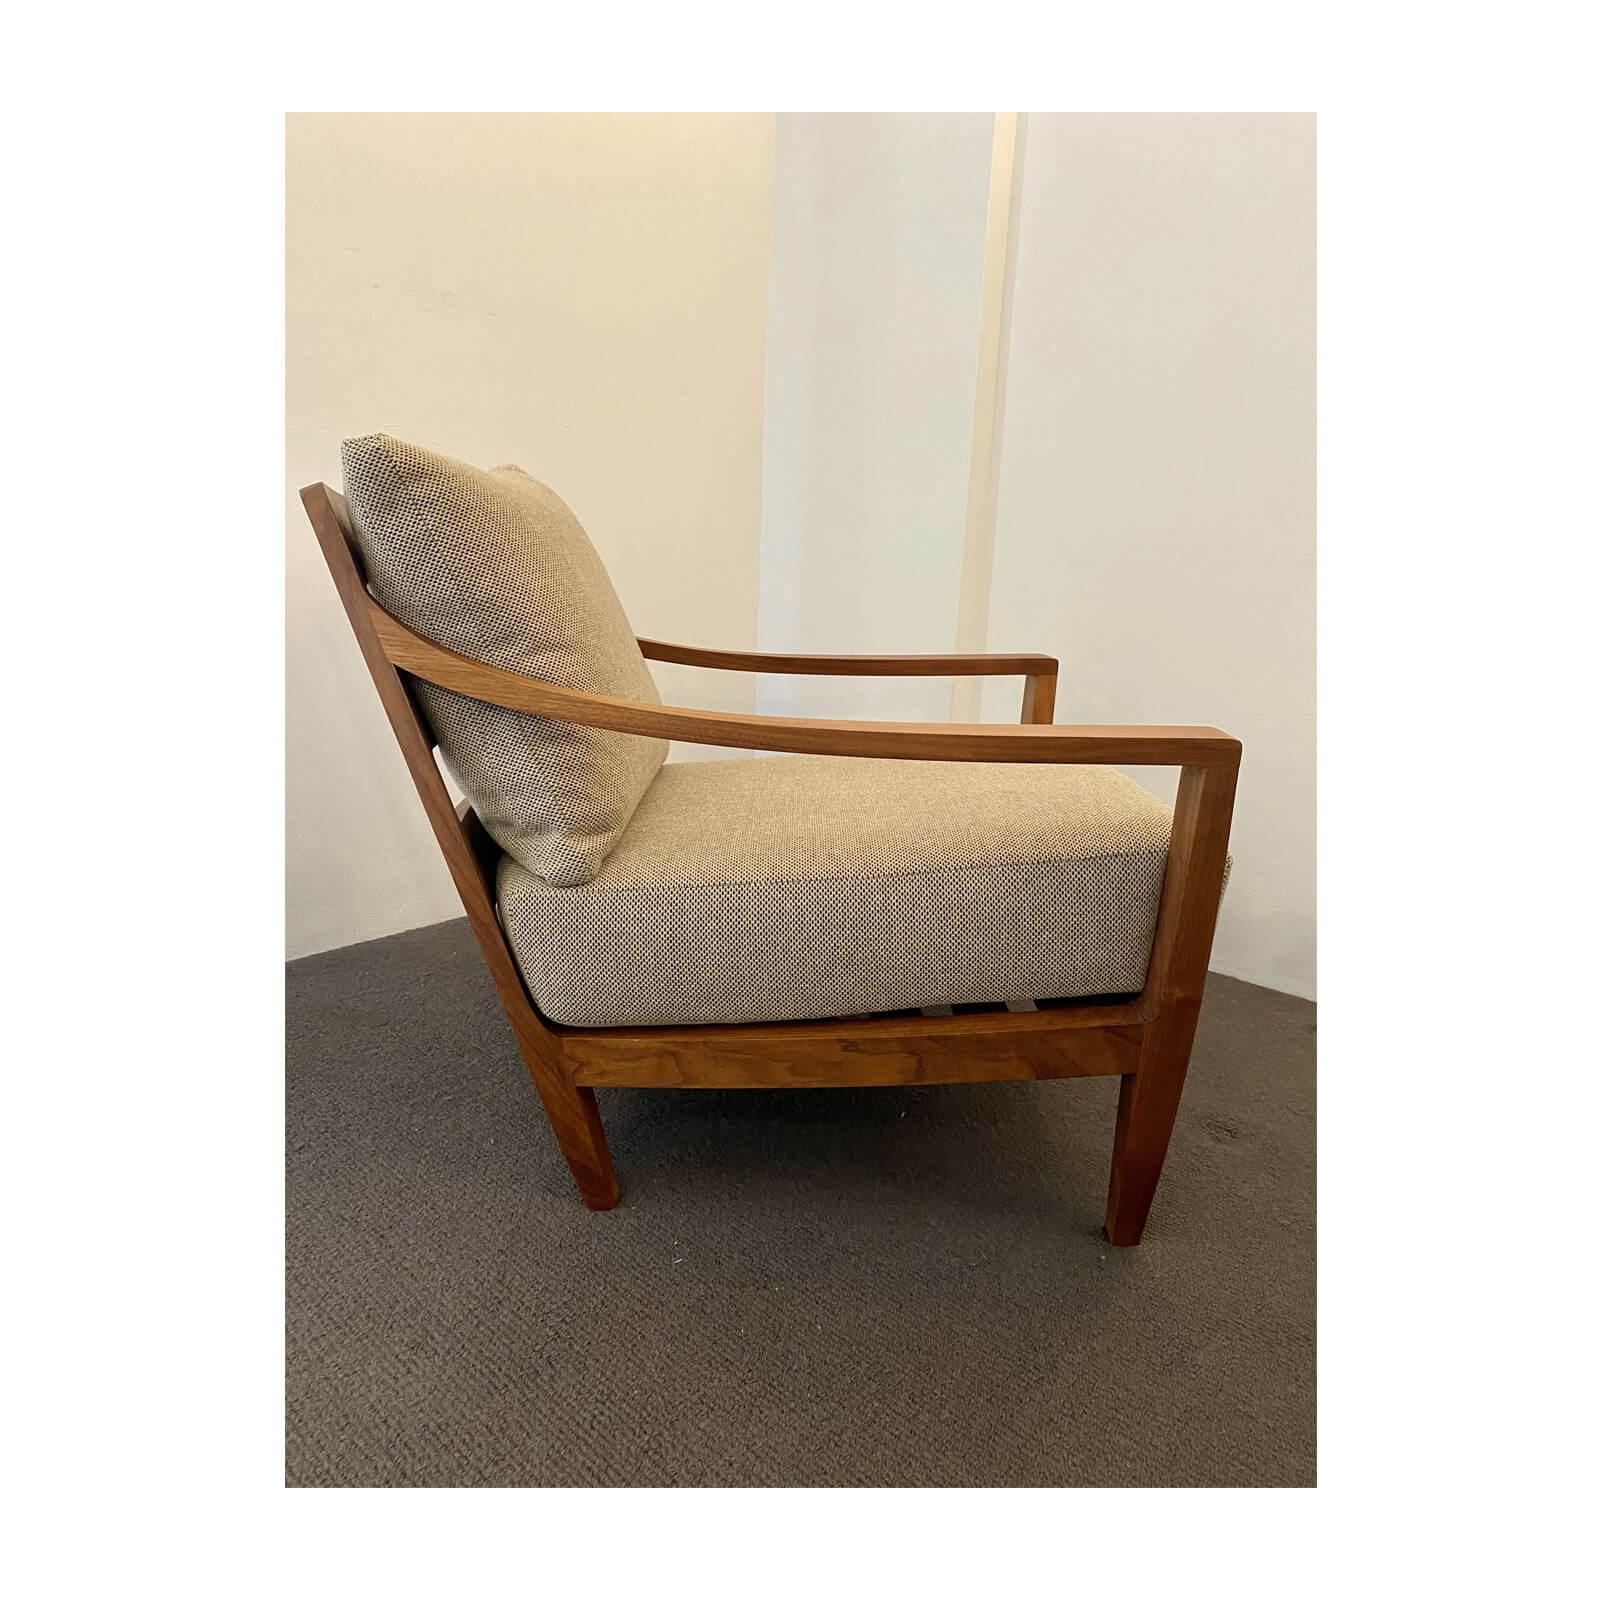 Two-Design-Lovers- De La Espada Matthew Hilton Low Lounge Chairs